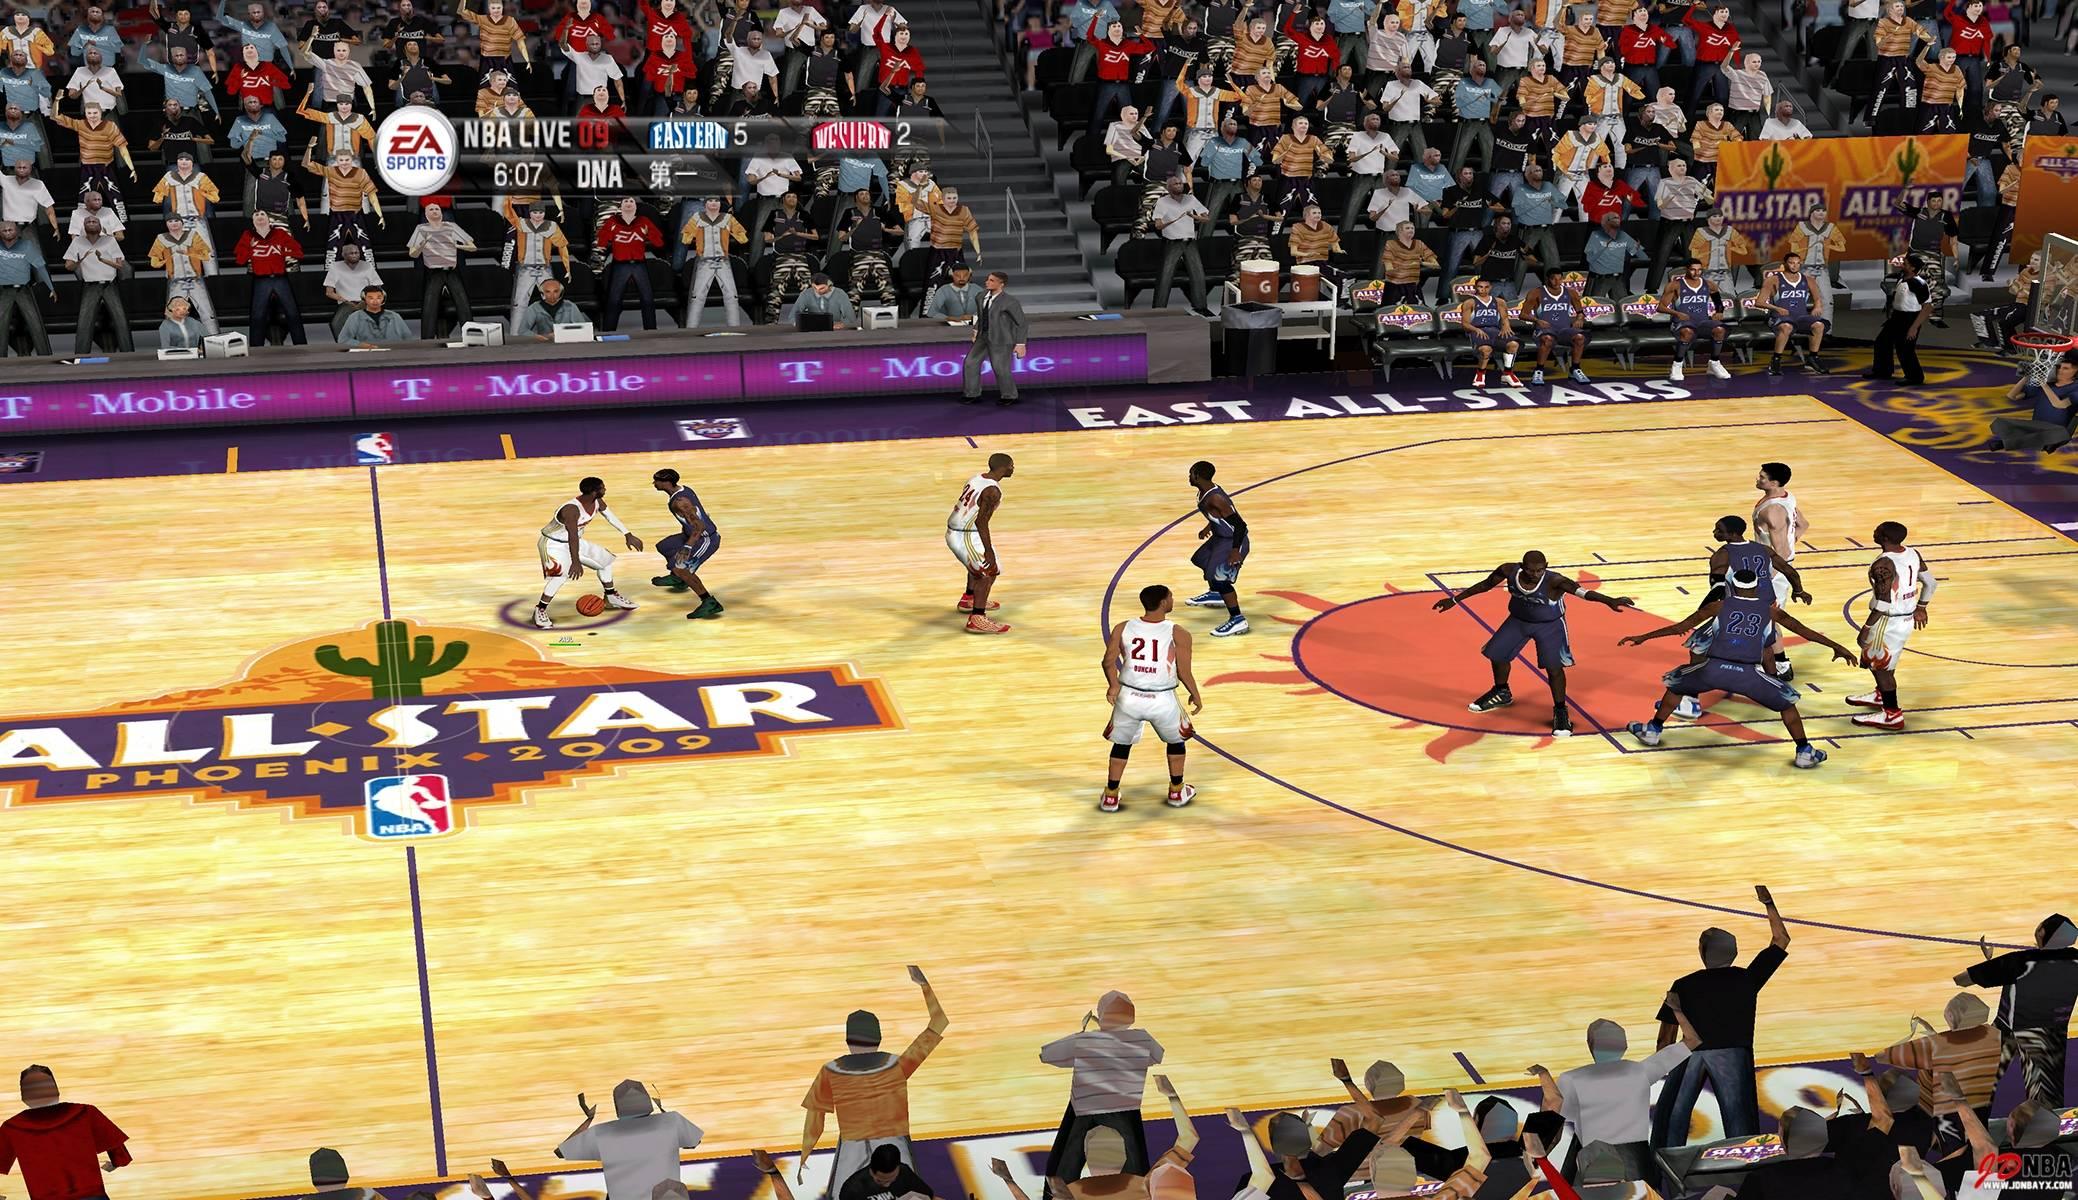 NBA LIVE 09【4K】-2021-08-29-01-14-17-137副本.jpg